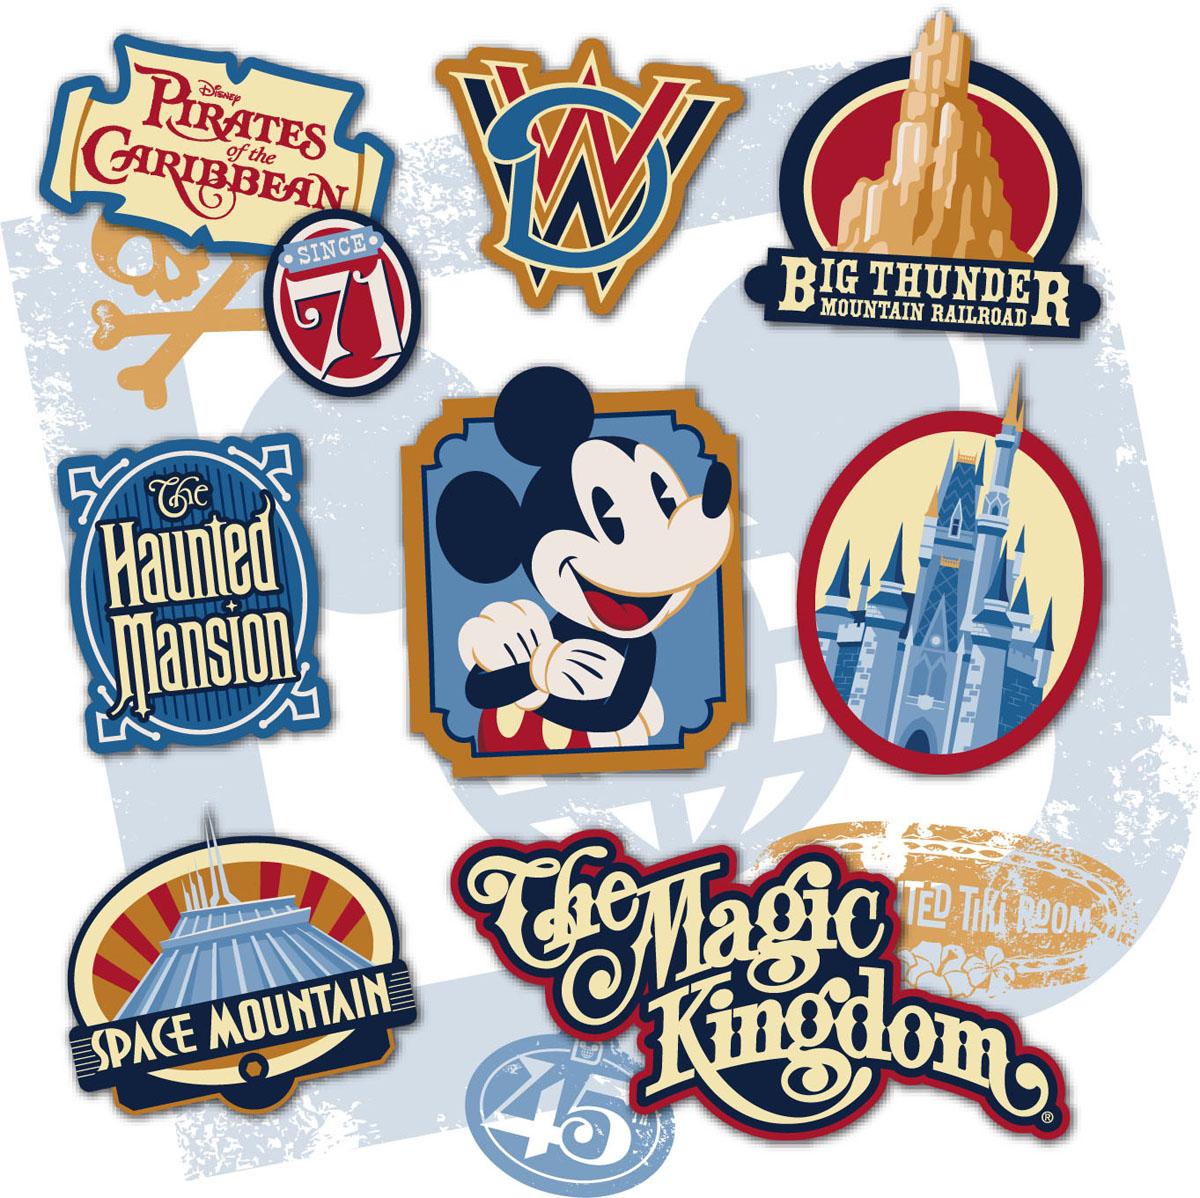 Magic kingdom disney world clipart graphic transparent library Disney World's Magic Kingdom to celebrate 45th anniversary on ... graphic transparent library